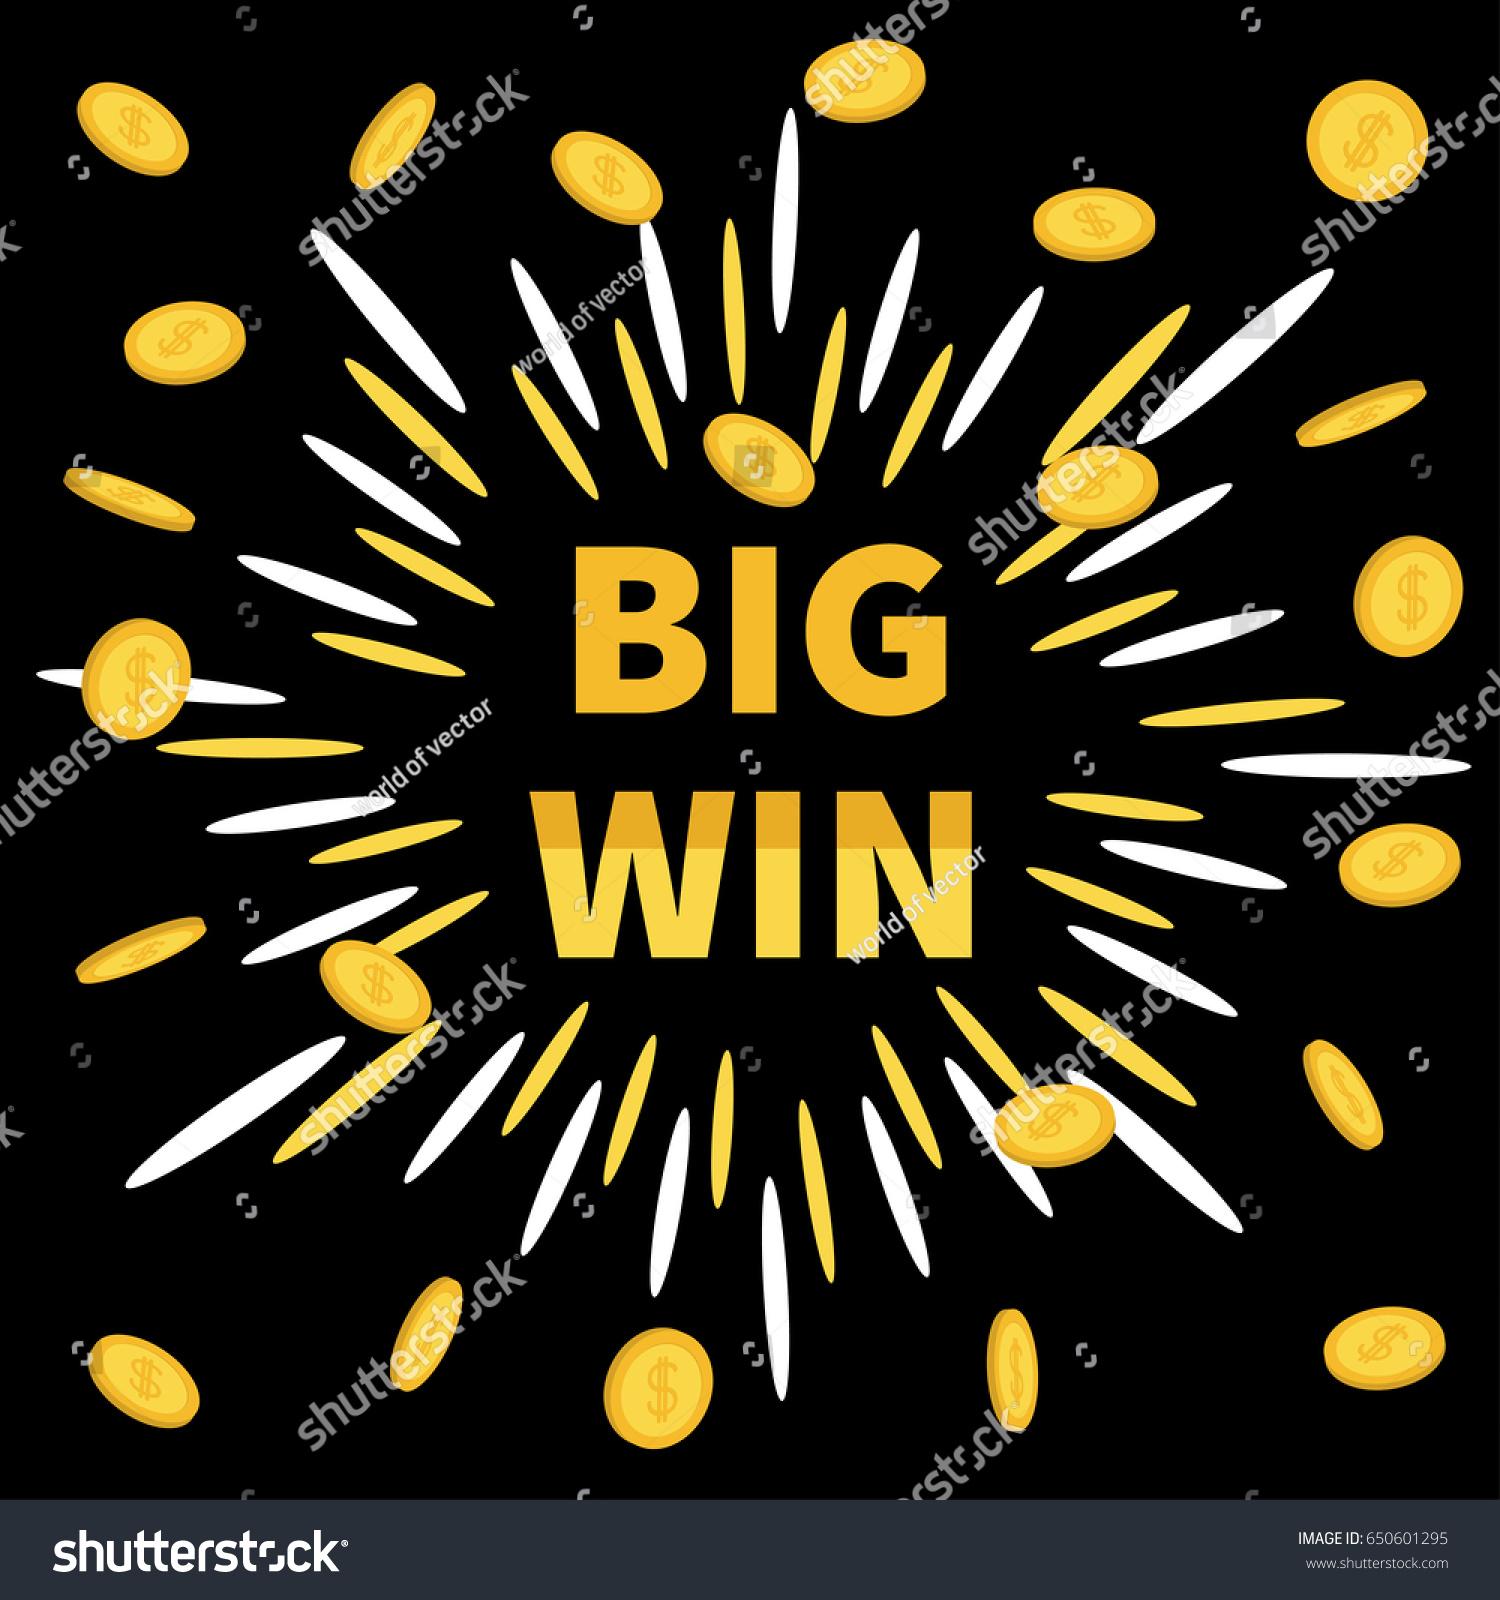 Онлайн gold rain казино вес фишки казино стандарт